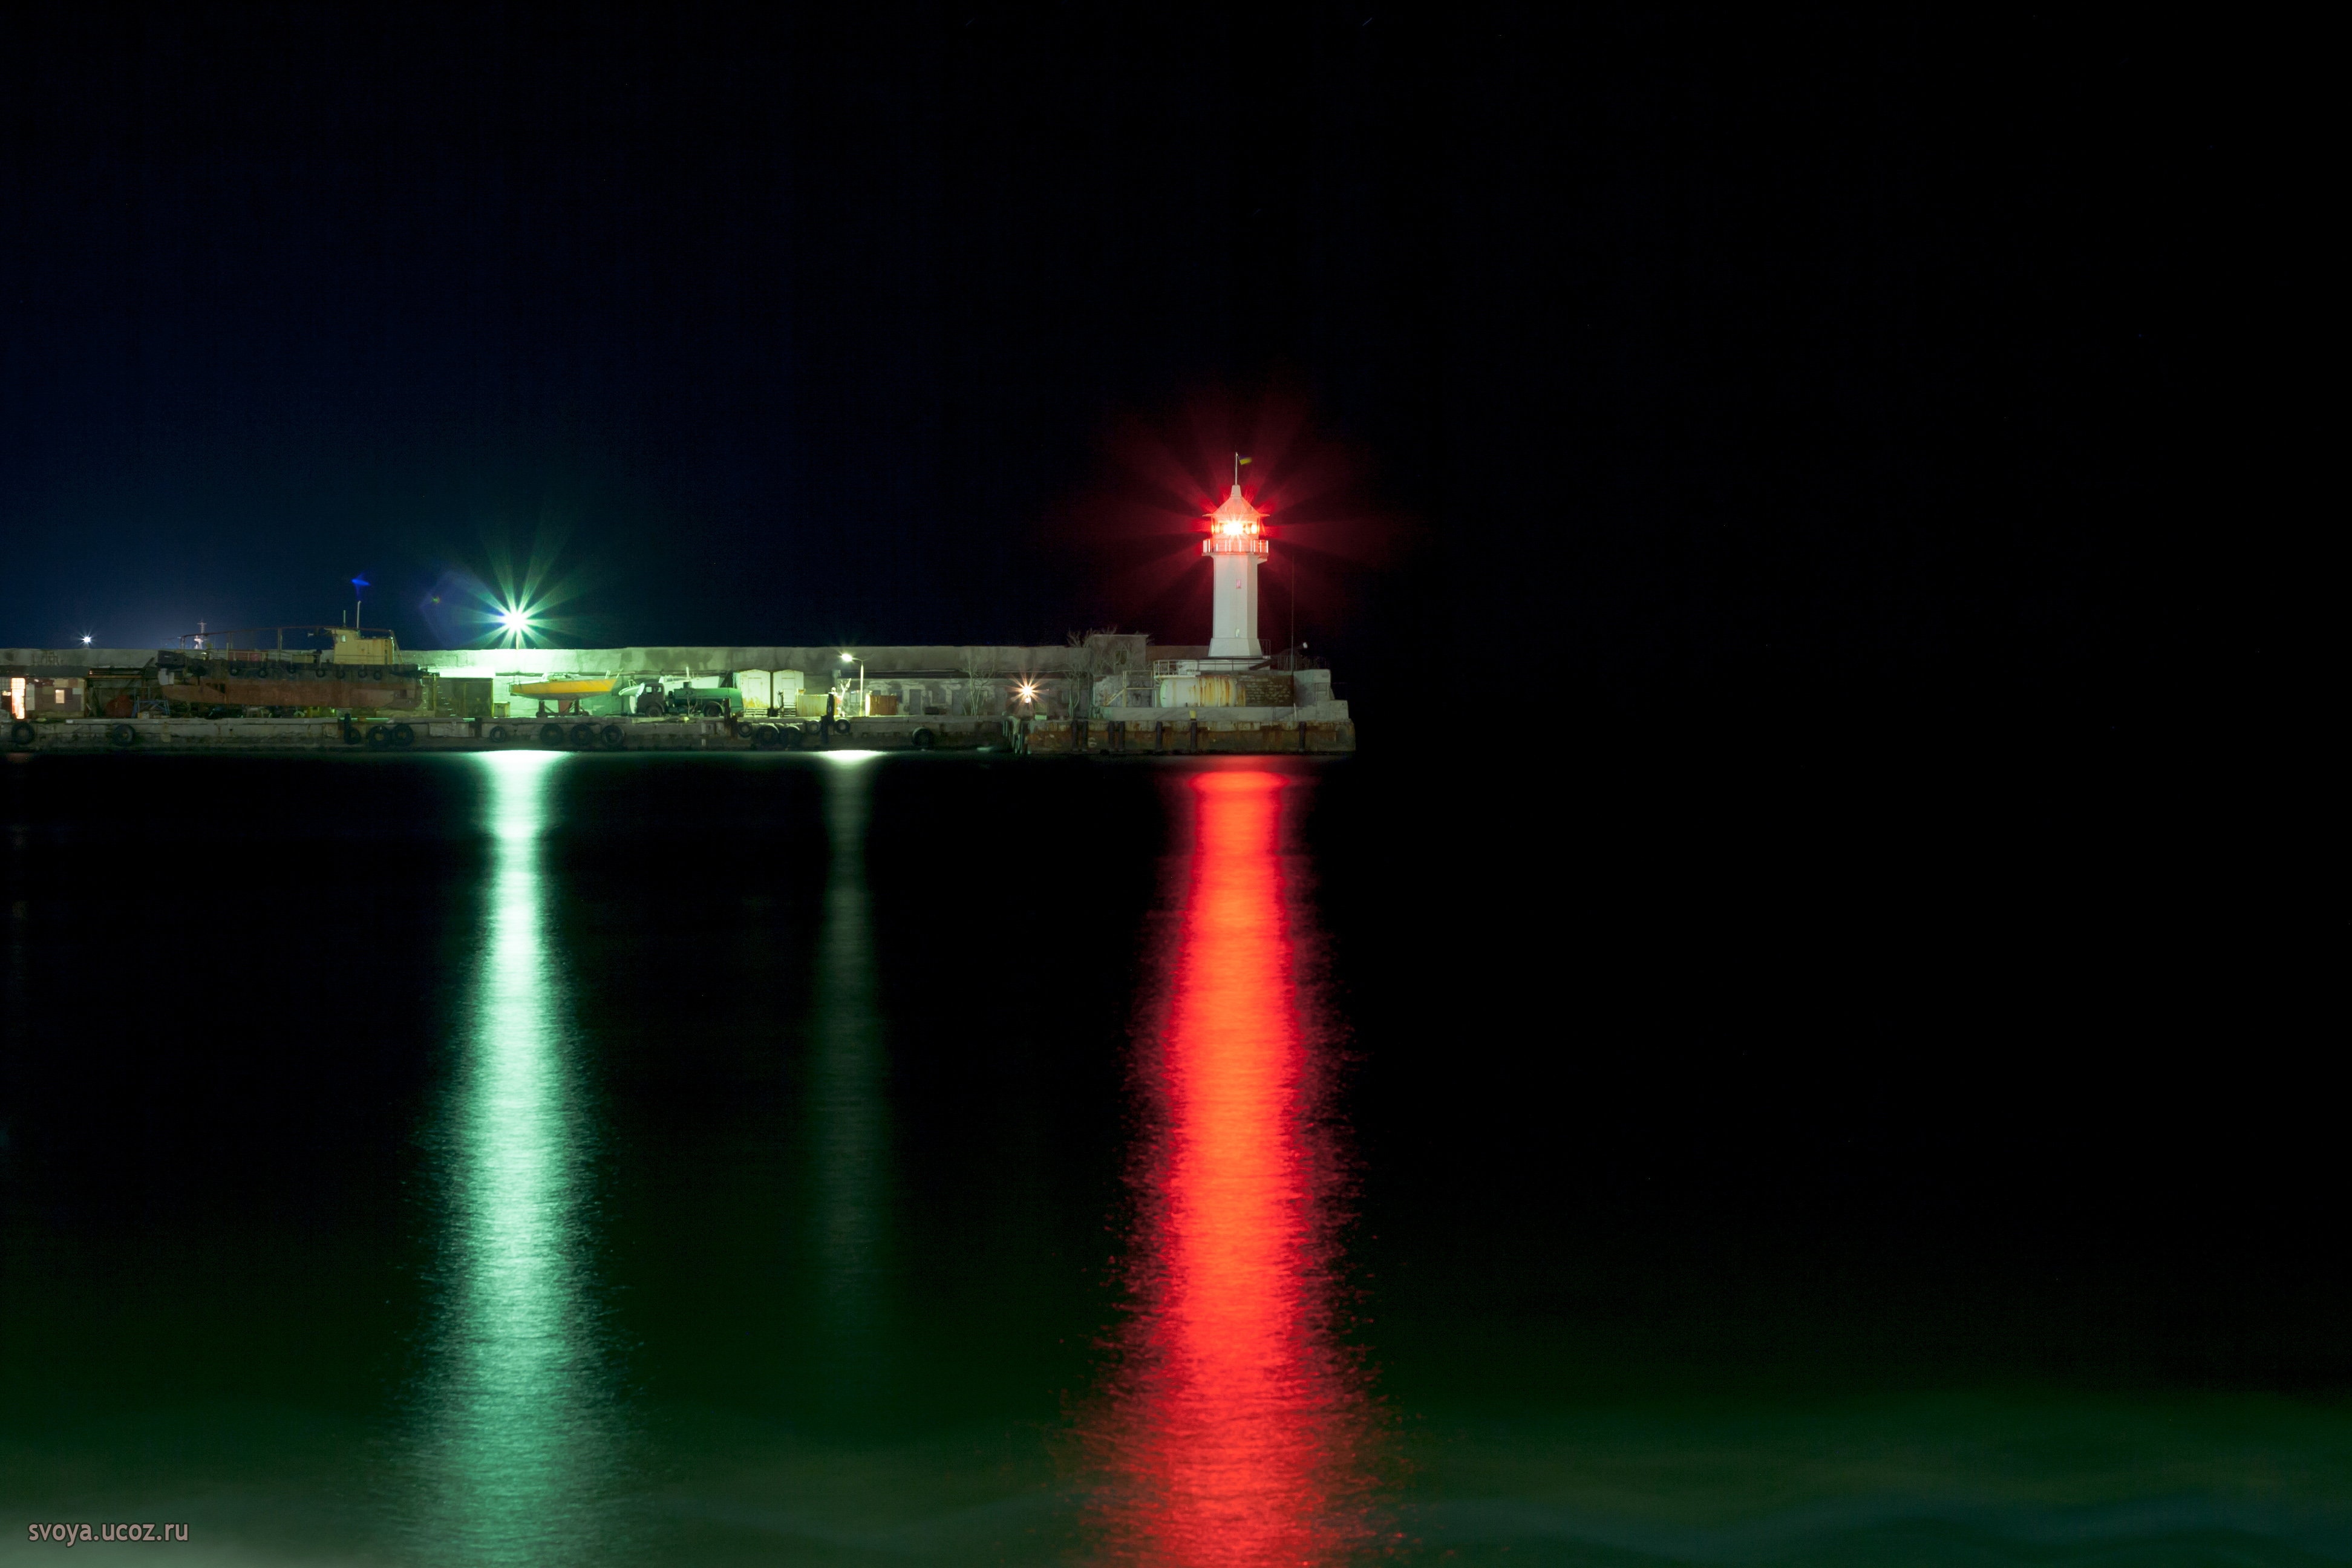 Ялта маяк ночью, hd фото